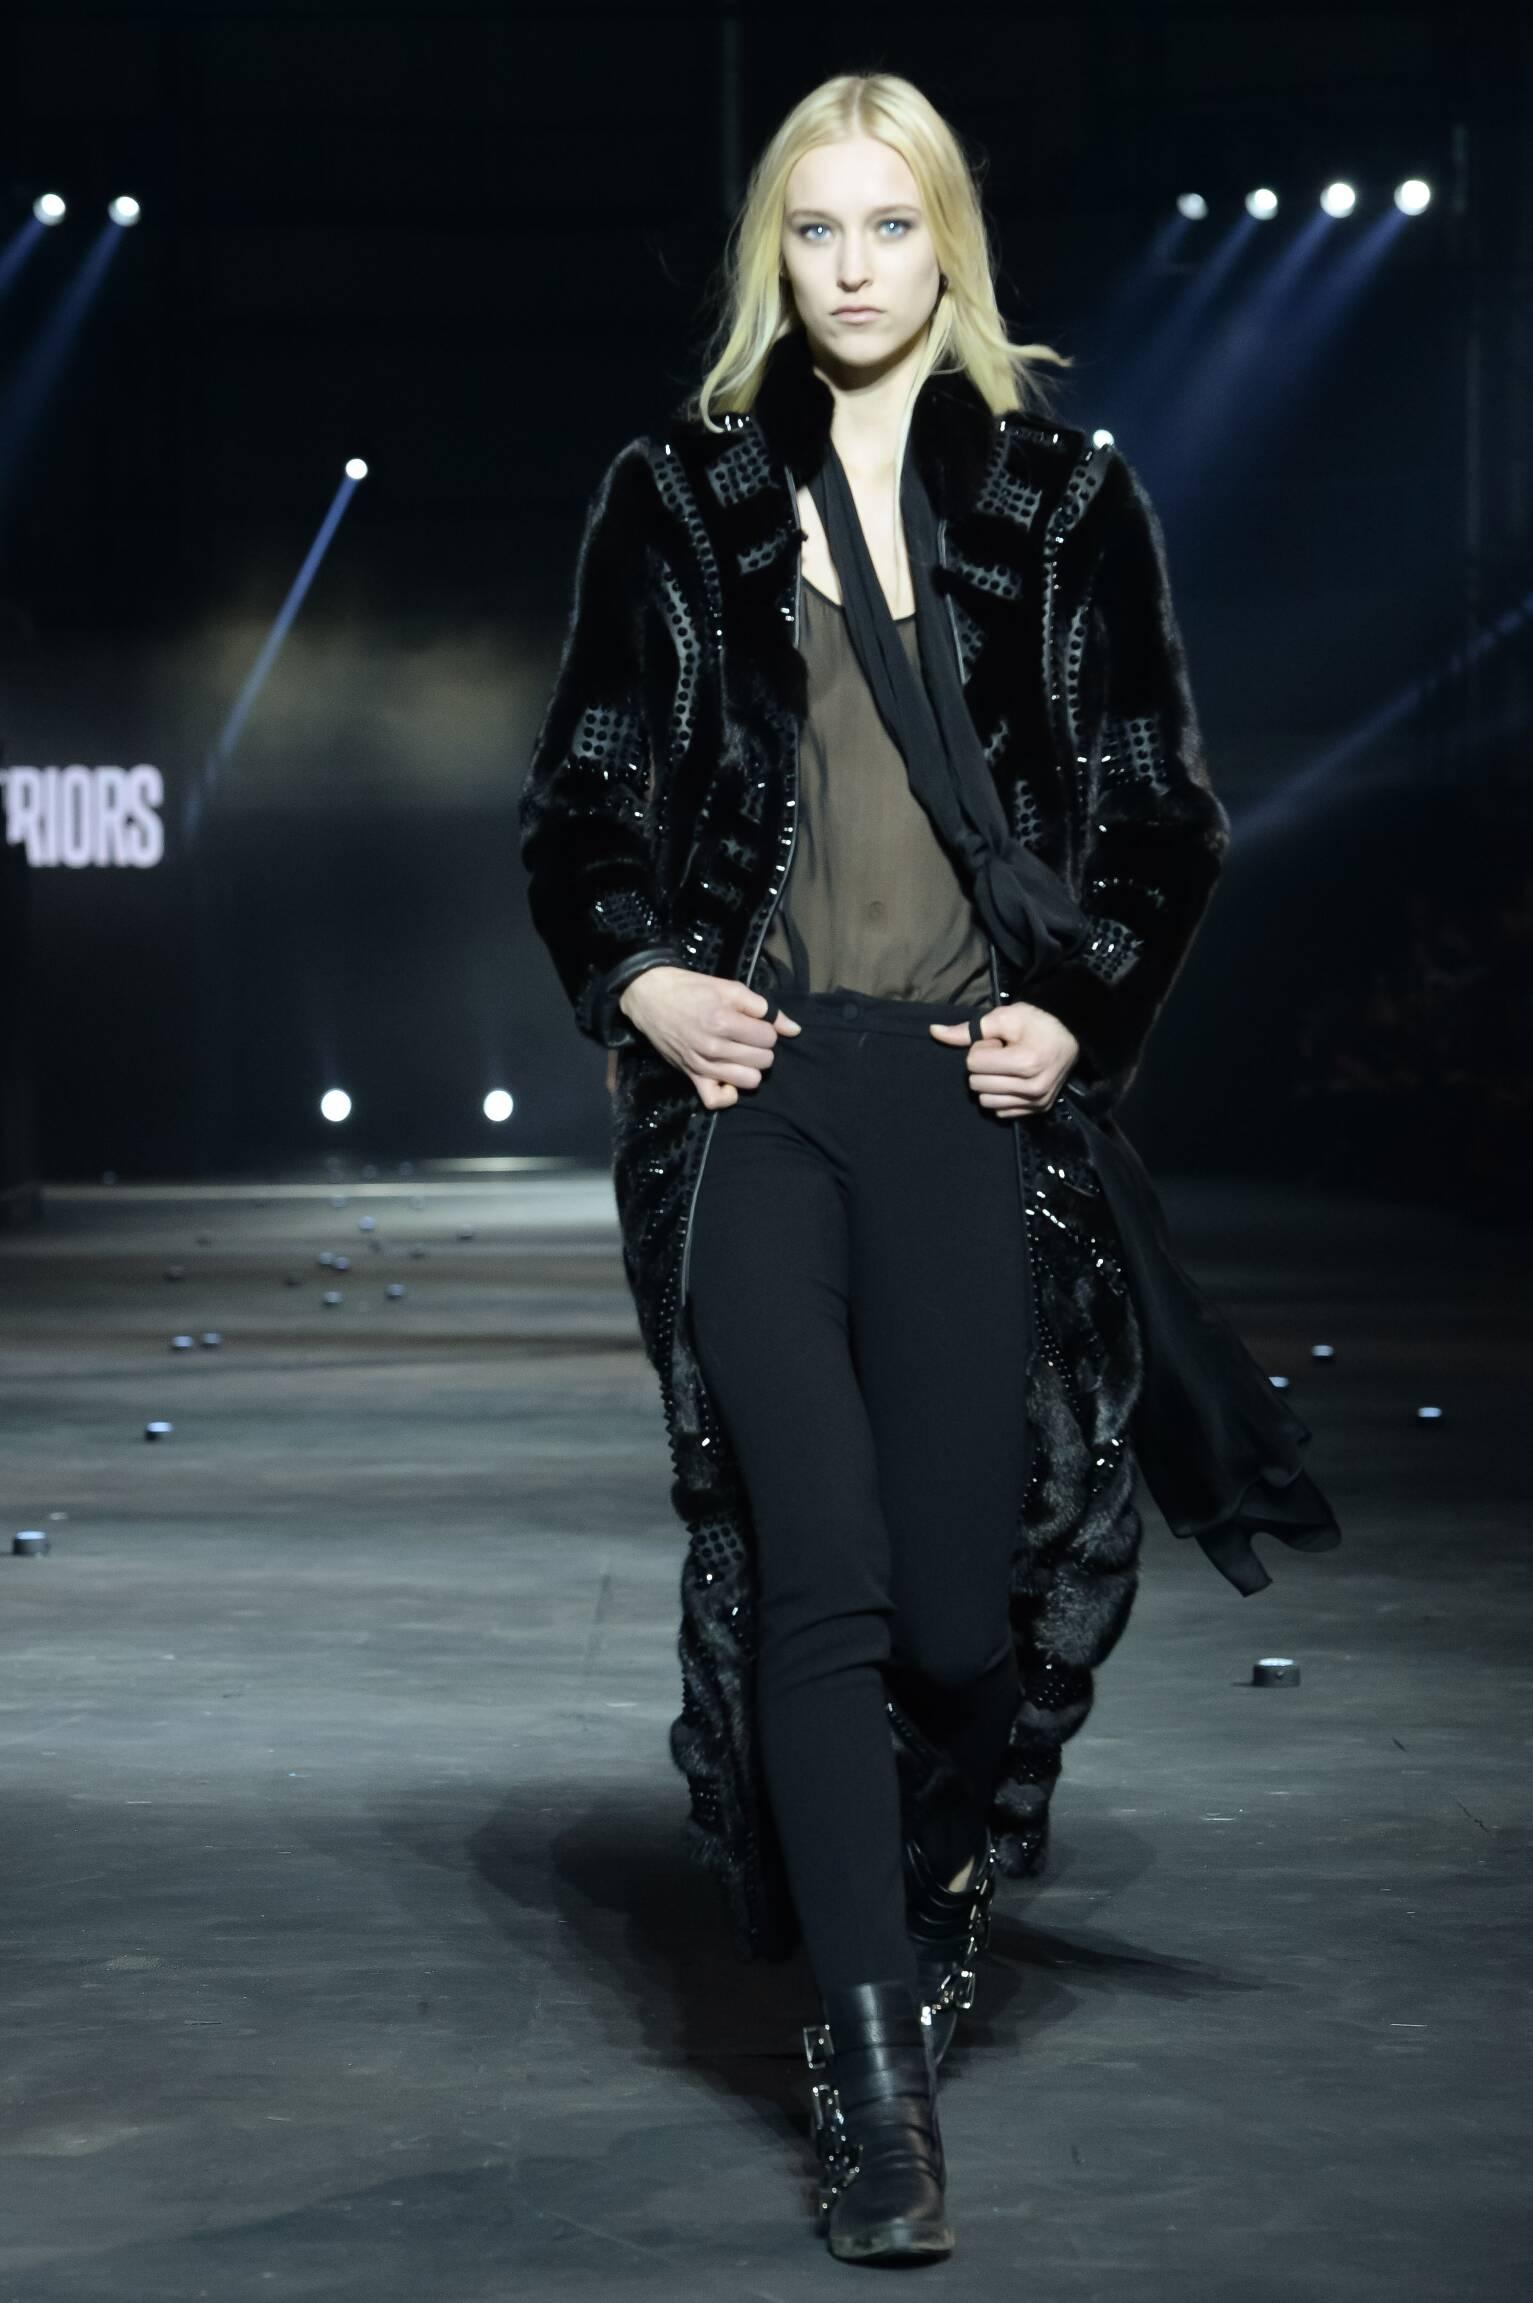 2015 Fashion Woman Model Philipp Plein Collection Catwalk